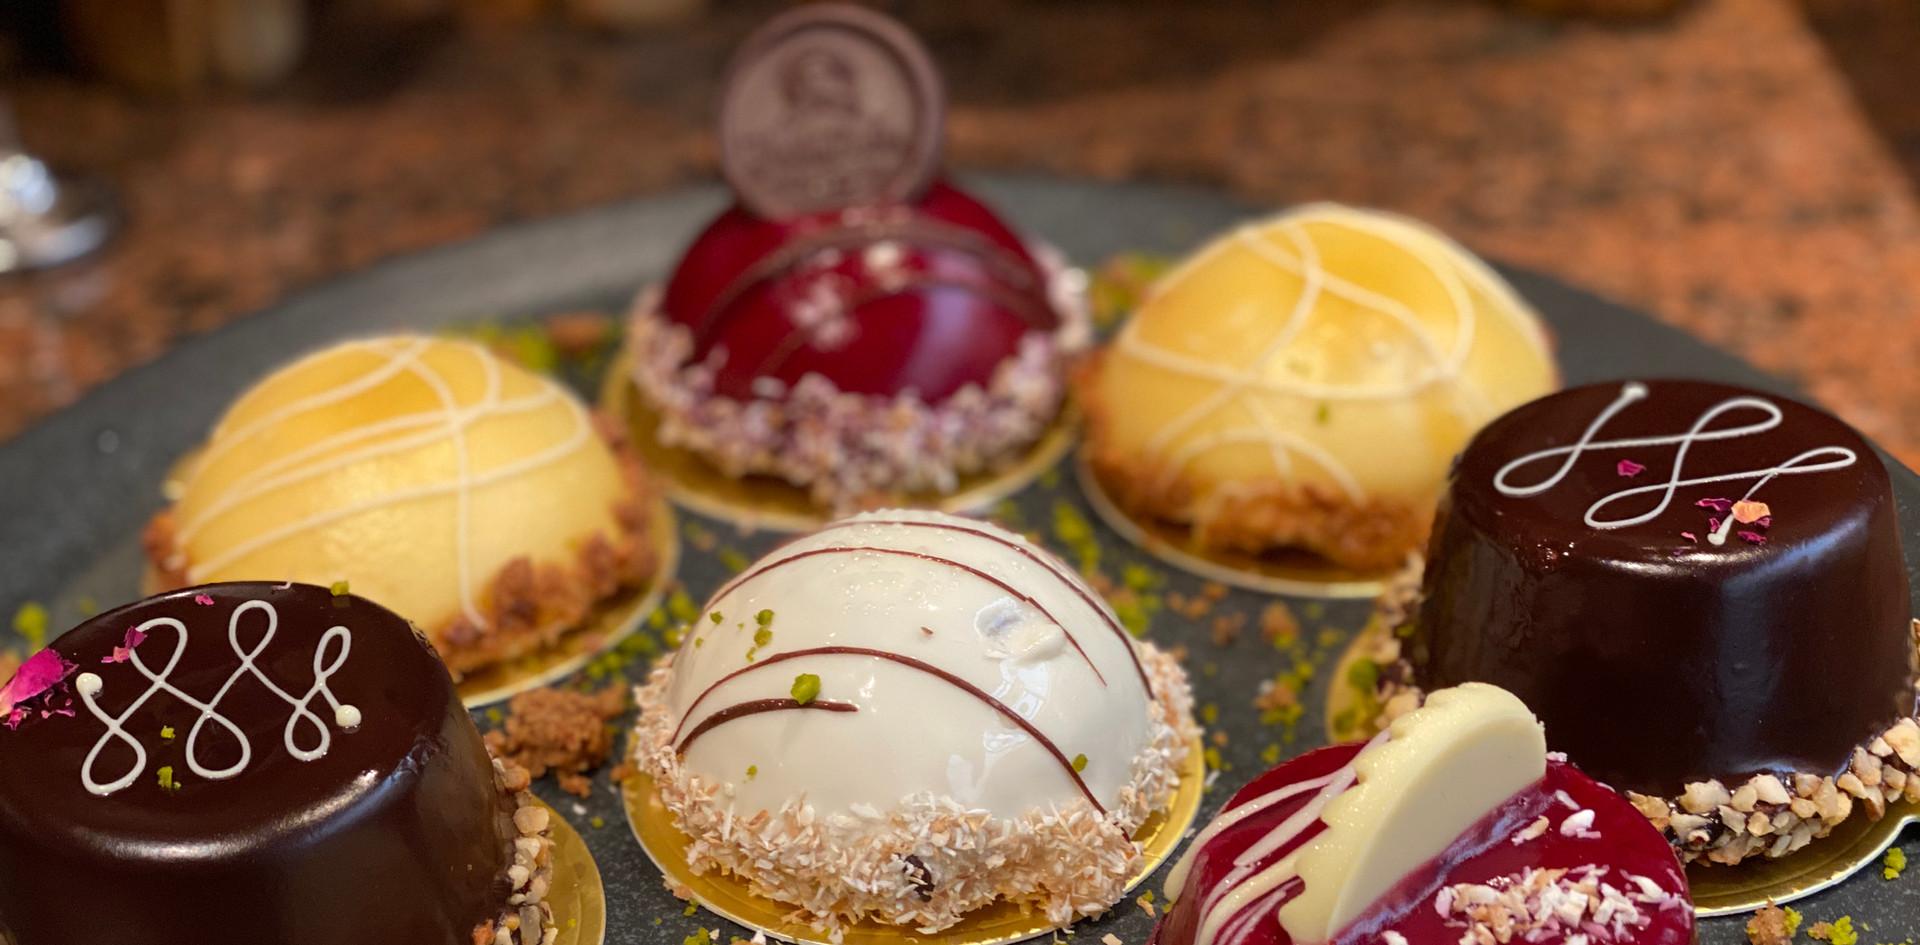 selbstgemachte Törtchen Lunch & Sweet - Hotel Wegner - The culinary Art Hotel